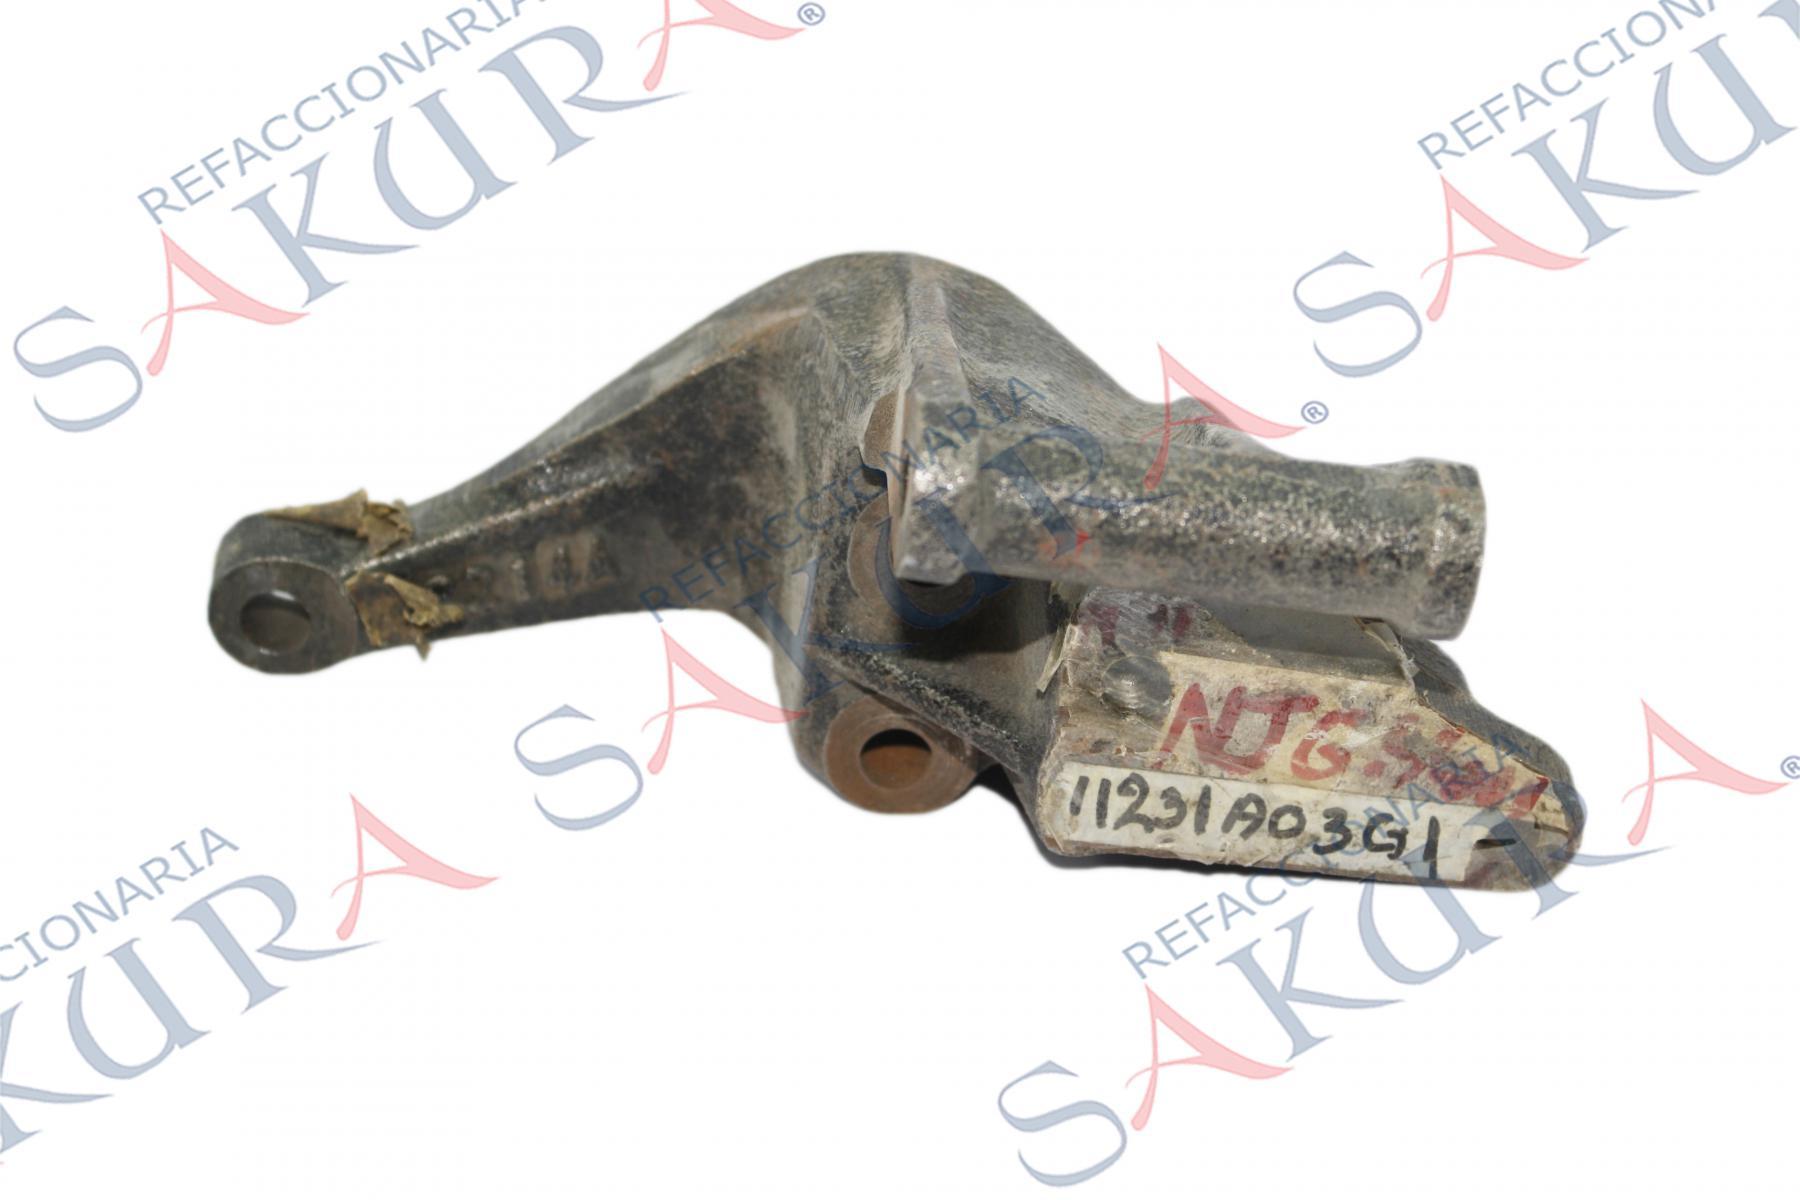 11231A03G1, Base Soporte Motor Derecho (Nissan)